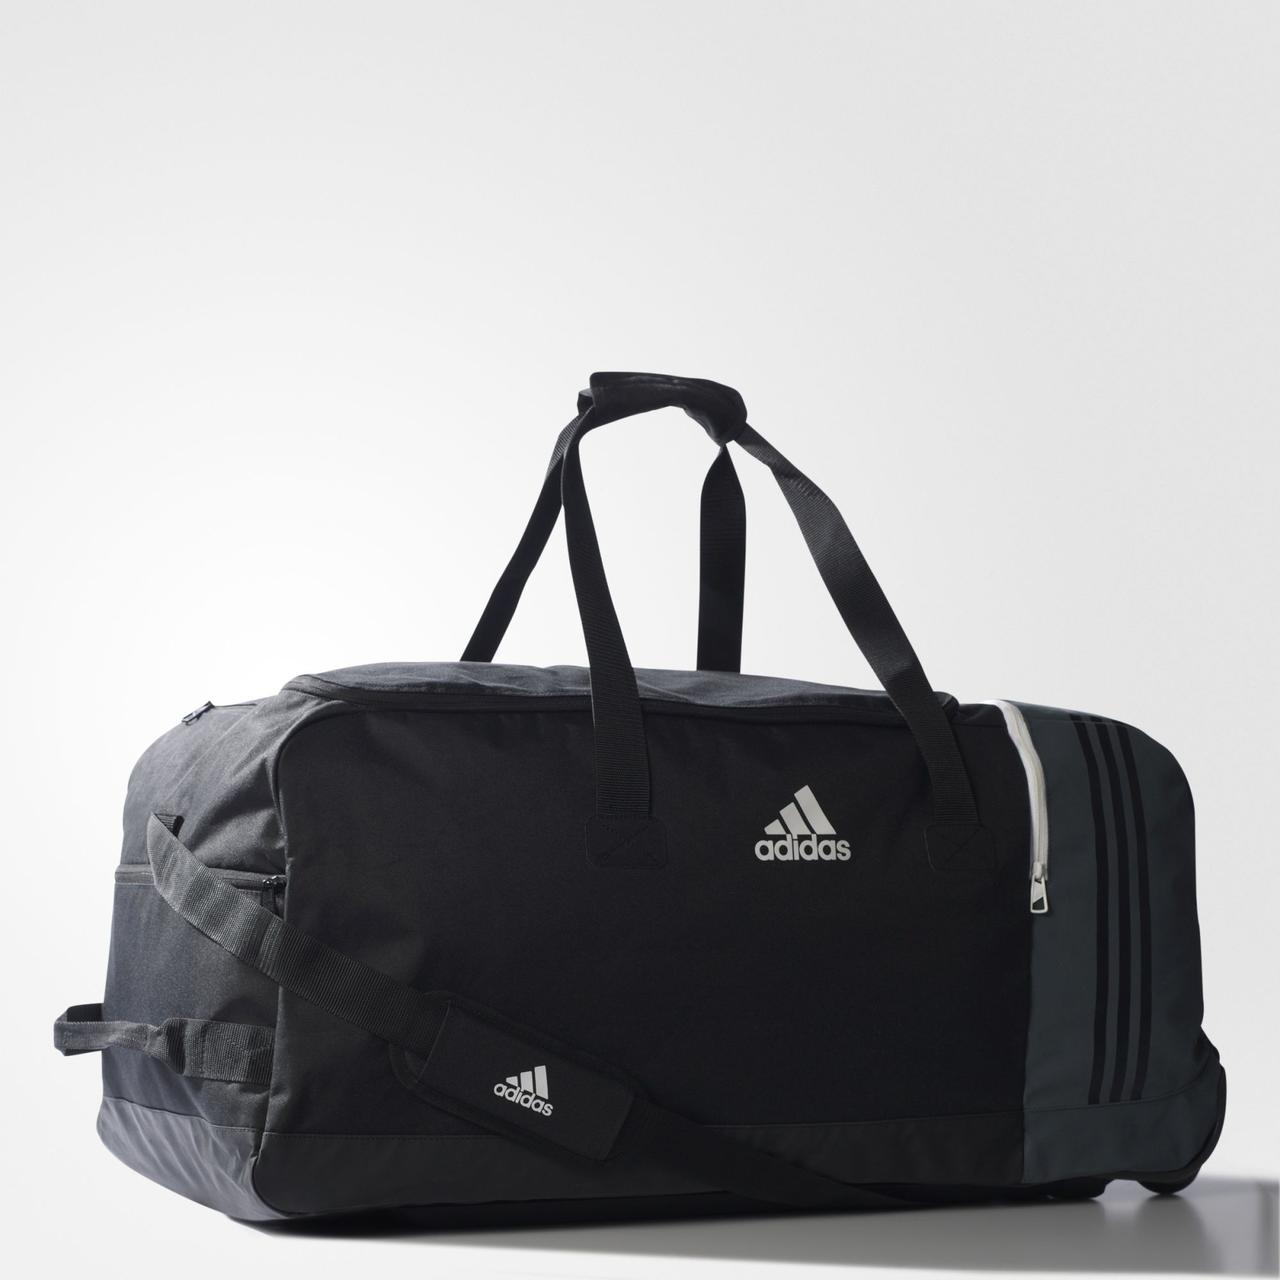 fef2fc31 Спортивная сумка на колесах ADIDAS Tiro Team Bag XL Football B46125 ...